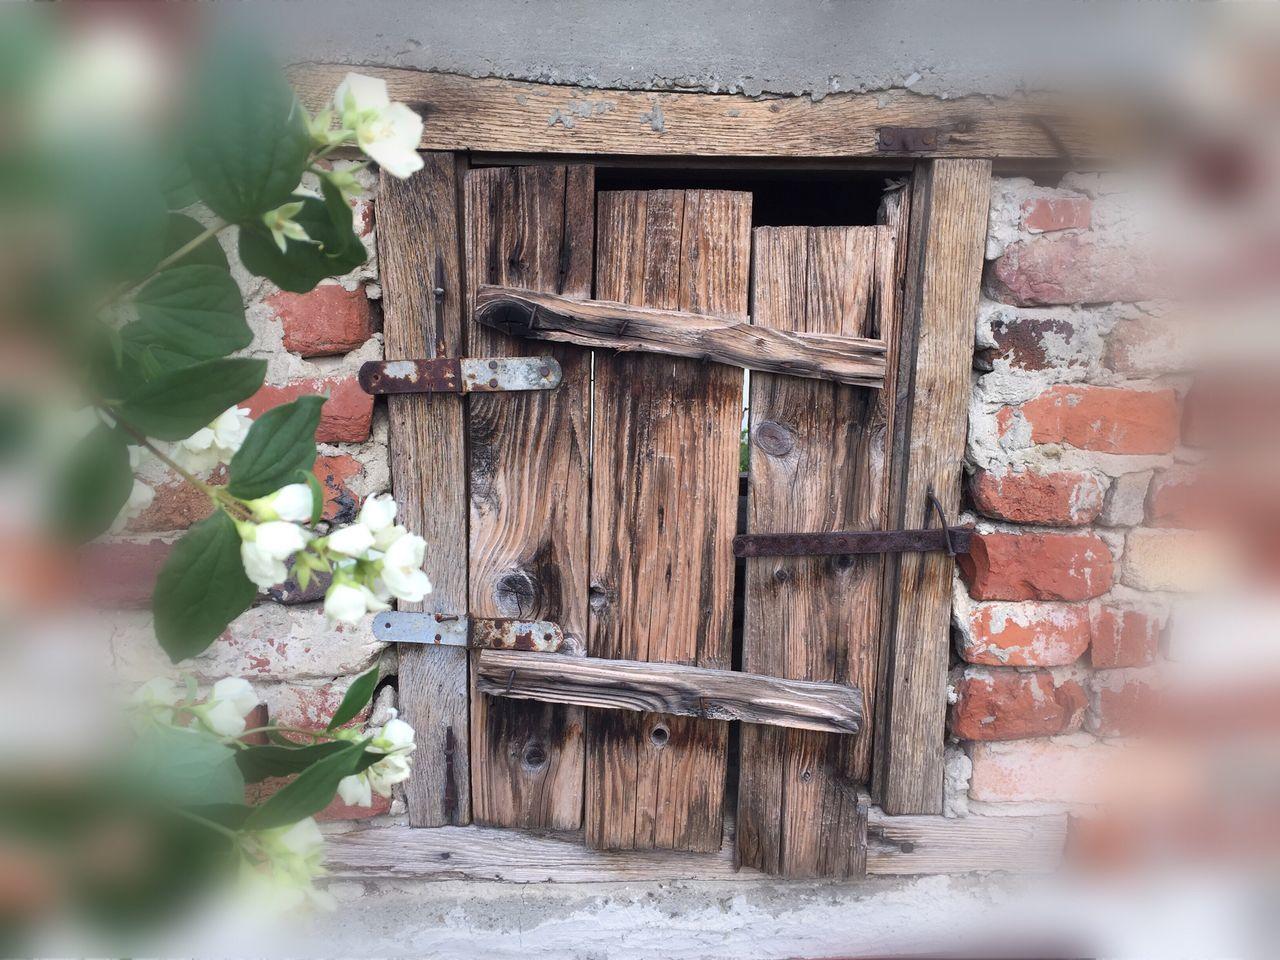 Door Day Wood - Material Outdoors Architecture Flower Leaf Growth Building Exterior Jasmine Flower Windows_aroundtheworld